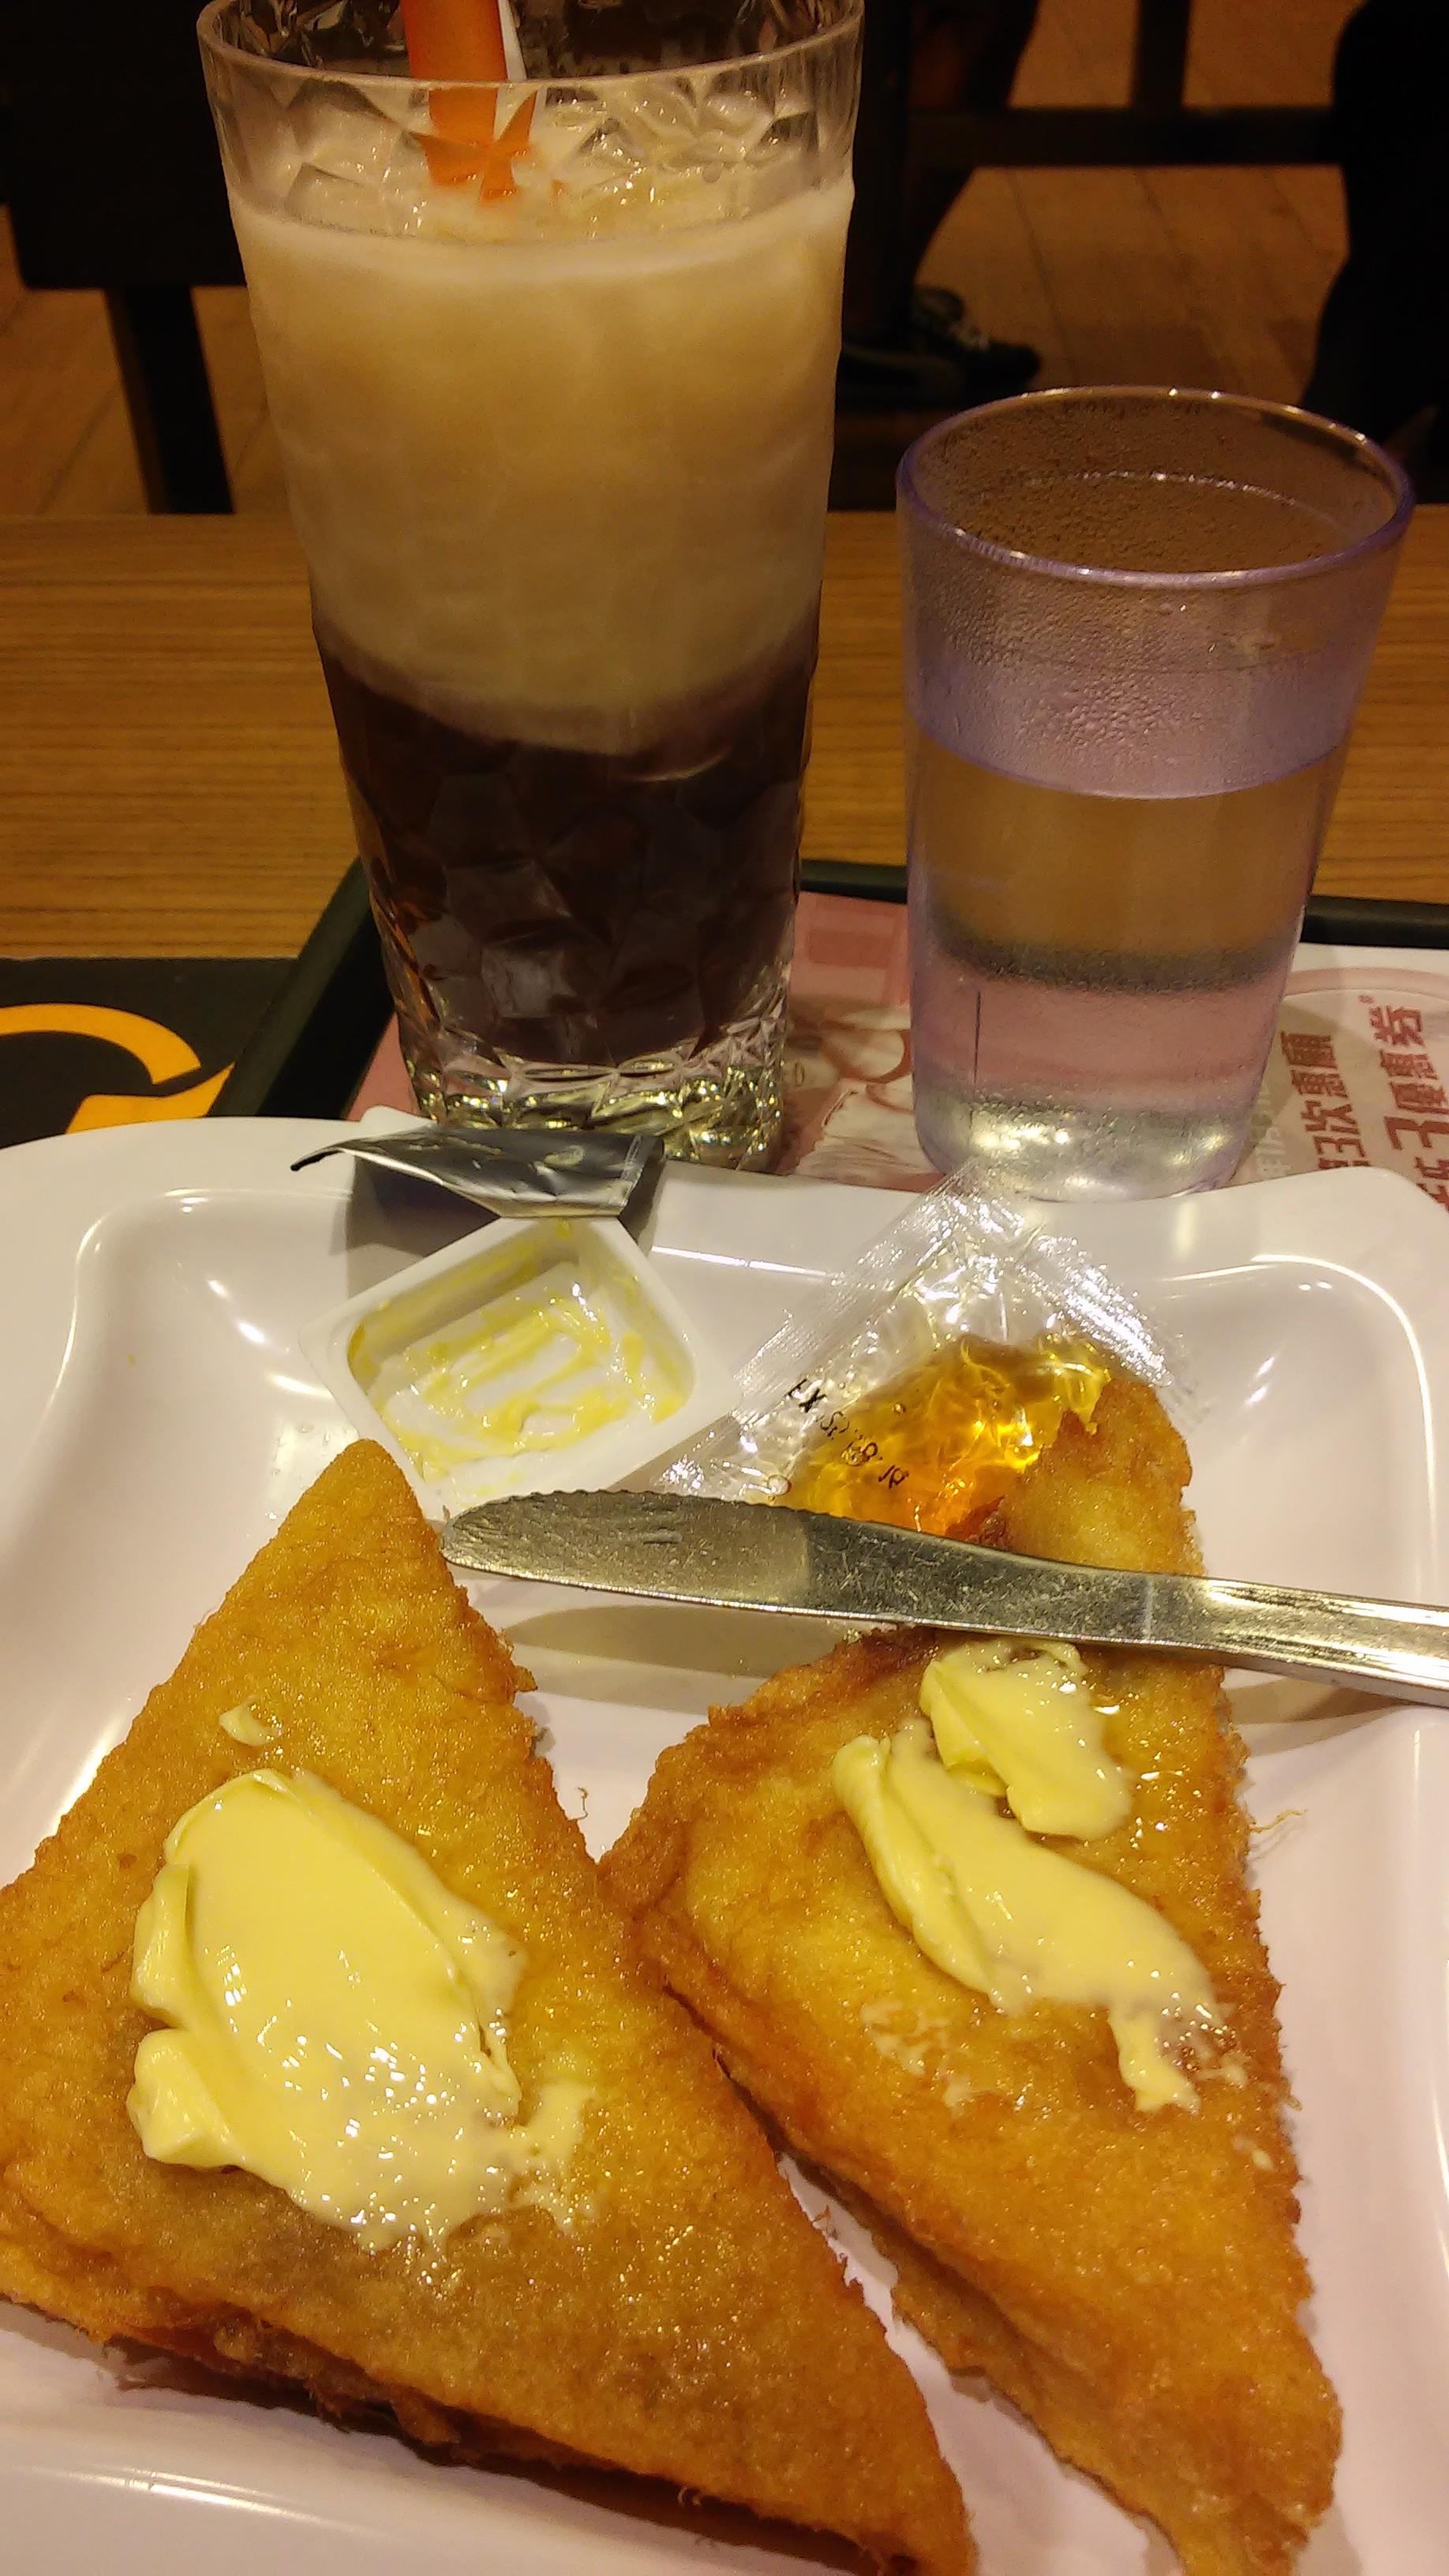 filehk food cafe de coral restaurant afternoon tea set - Yellow Restaurant 2015